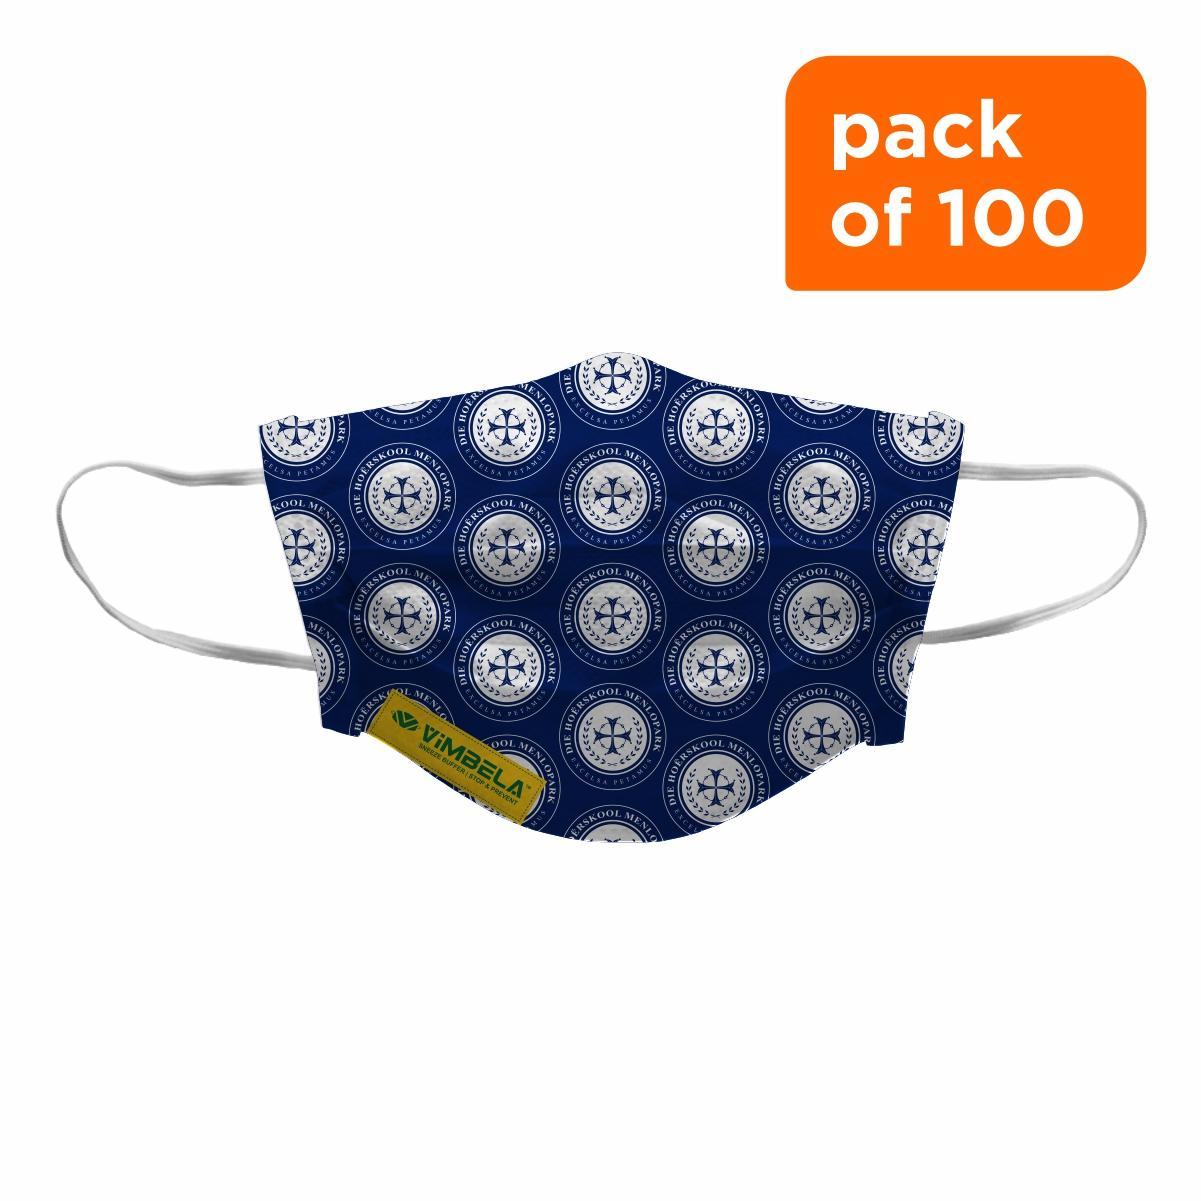 Vimbela Smu 3 Ply (pack Of 100)